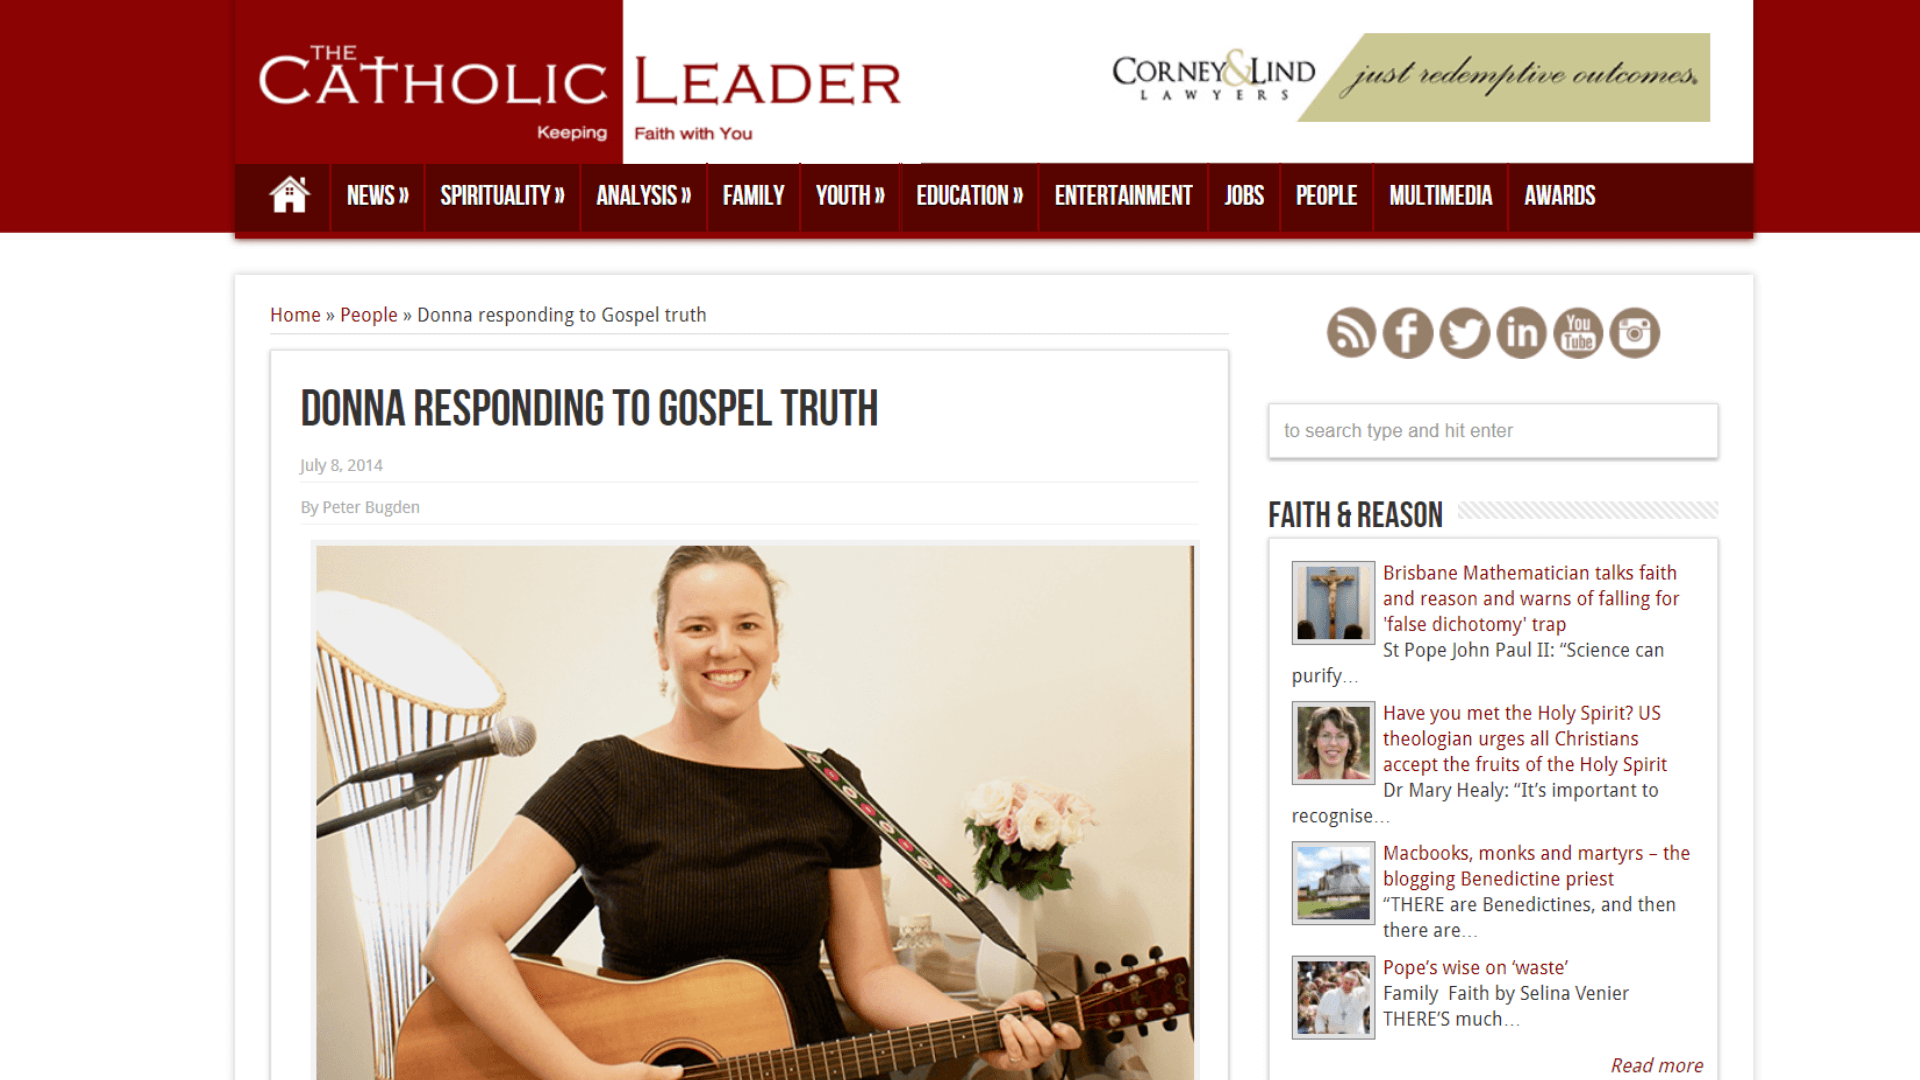 Donna Power catholic school retreats facilitator article by Peter Budgen in the Catholic Leader, Brisbane.